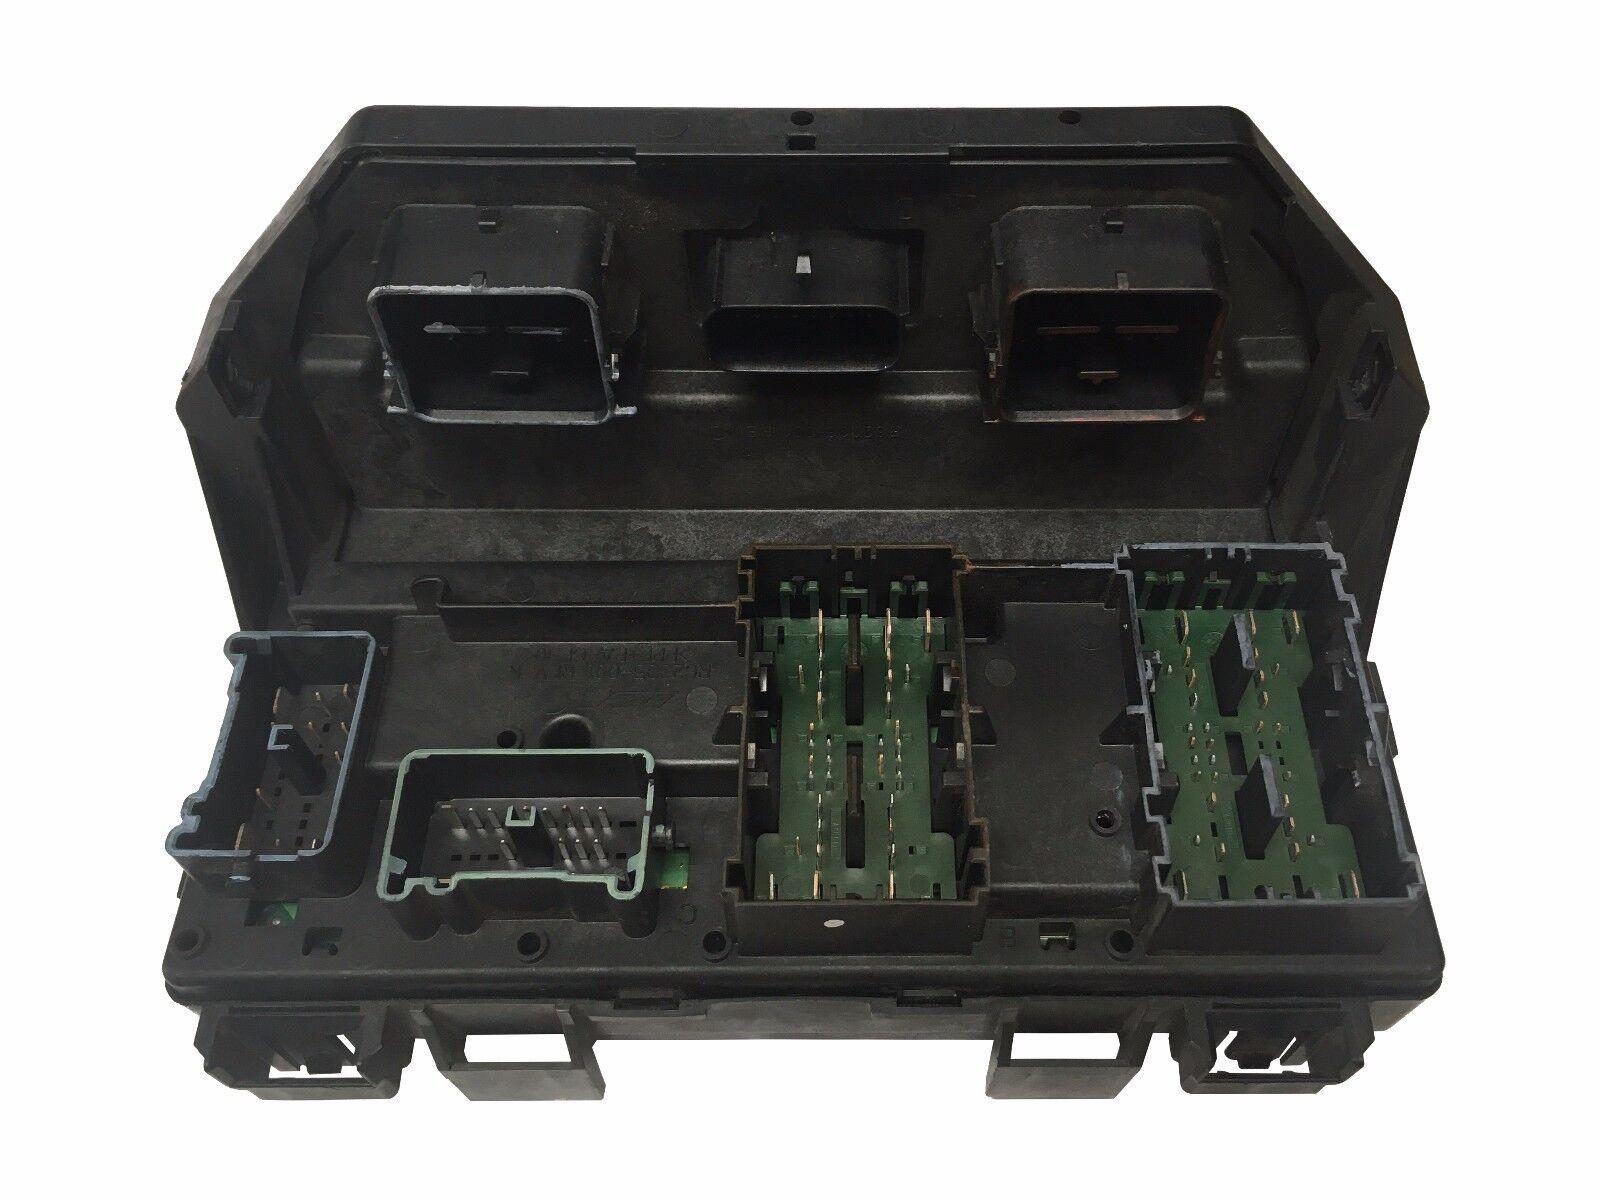 Routan Fuse Box Diagram Wiring Diagrams 2012 Highlander Vw Used Volkswagen Computers And